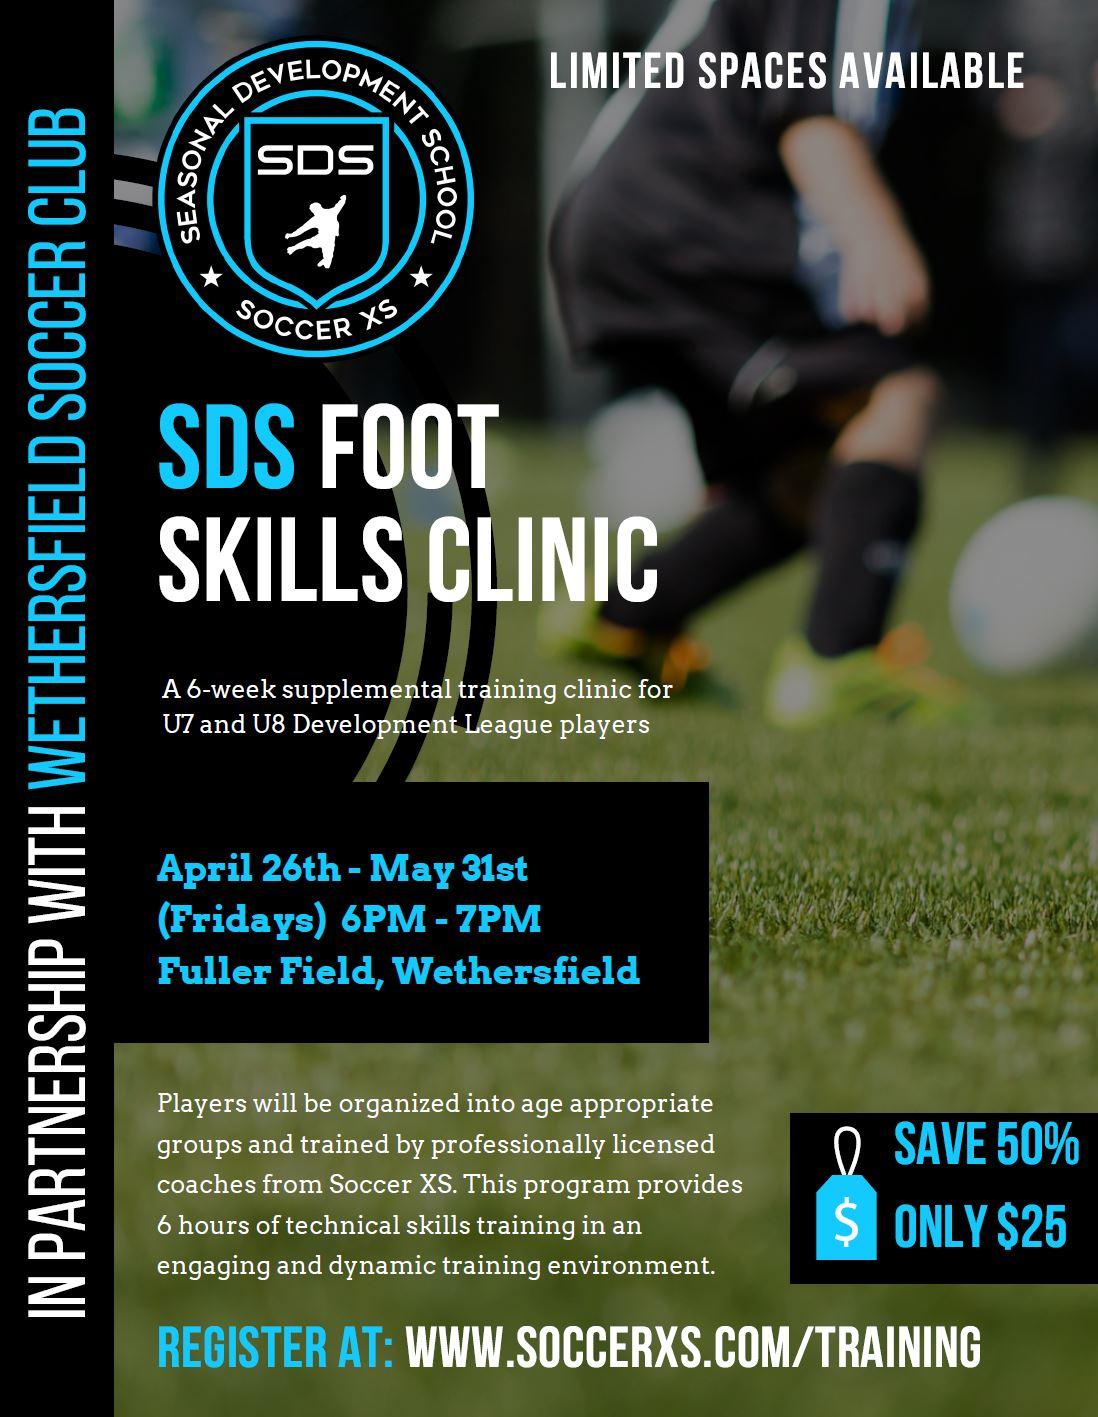 SDS Foot Skills Clinic (Wethersfield Soccer Club)